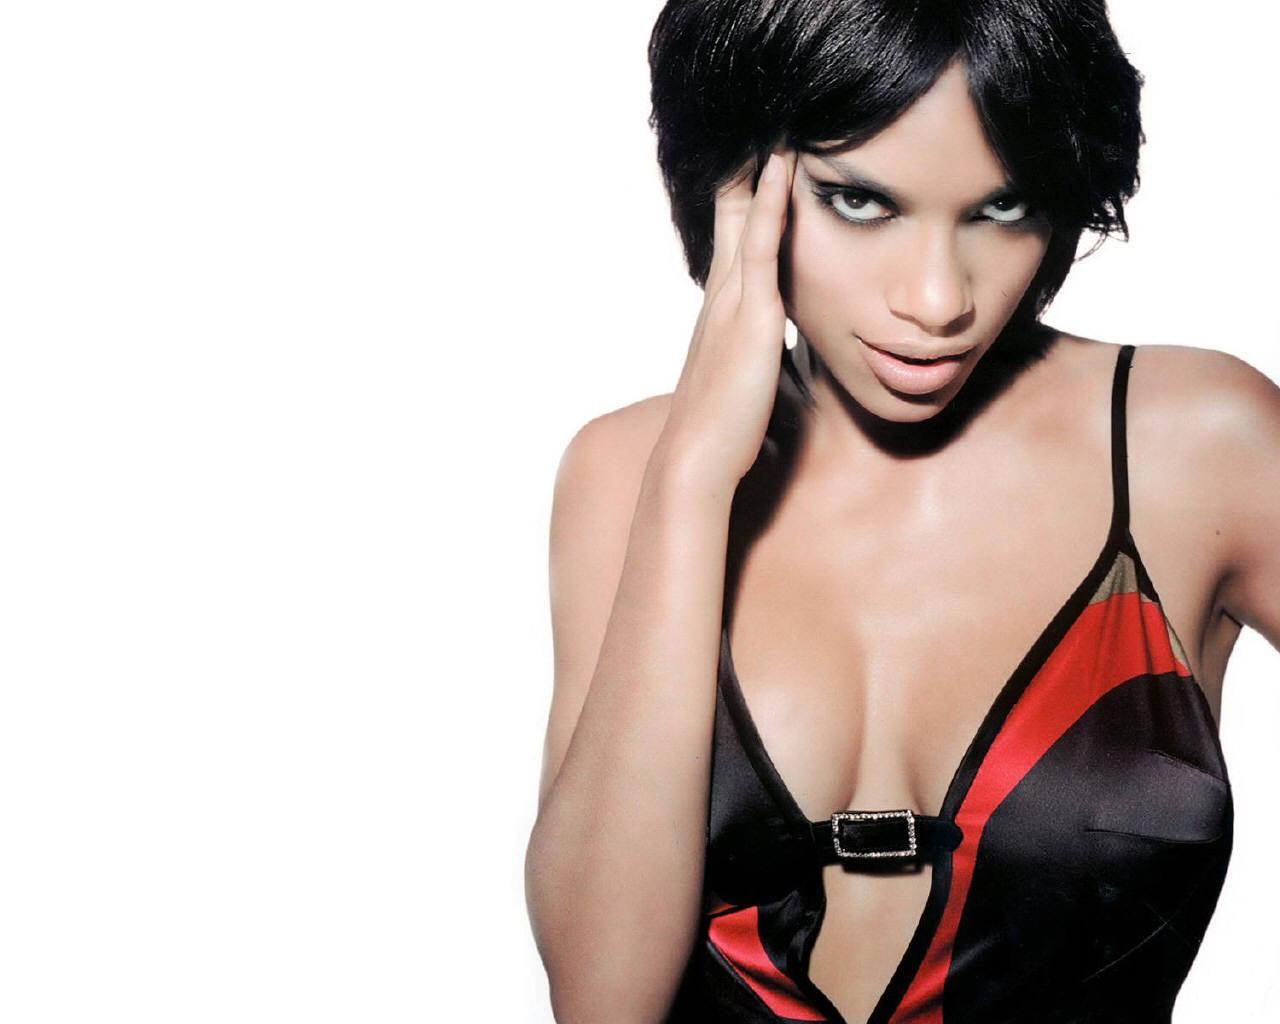 Hot Rosario Dawson nudes (68 photos), Sexy, Sideboobs, Boobs, cleavage 2006